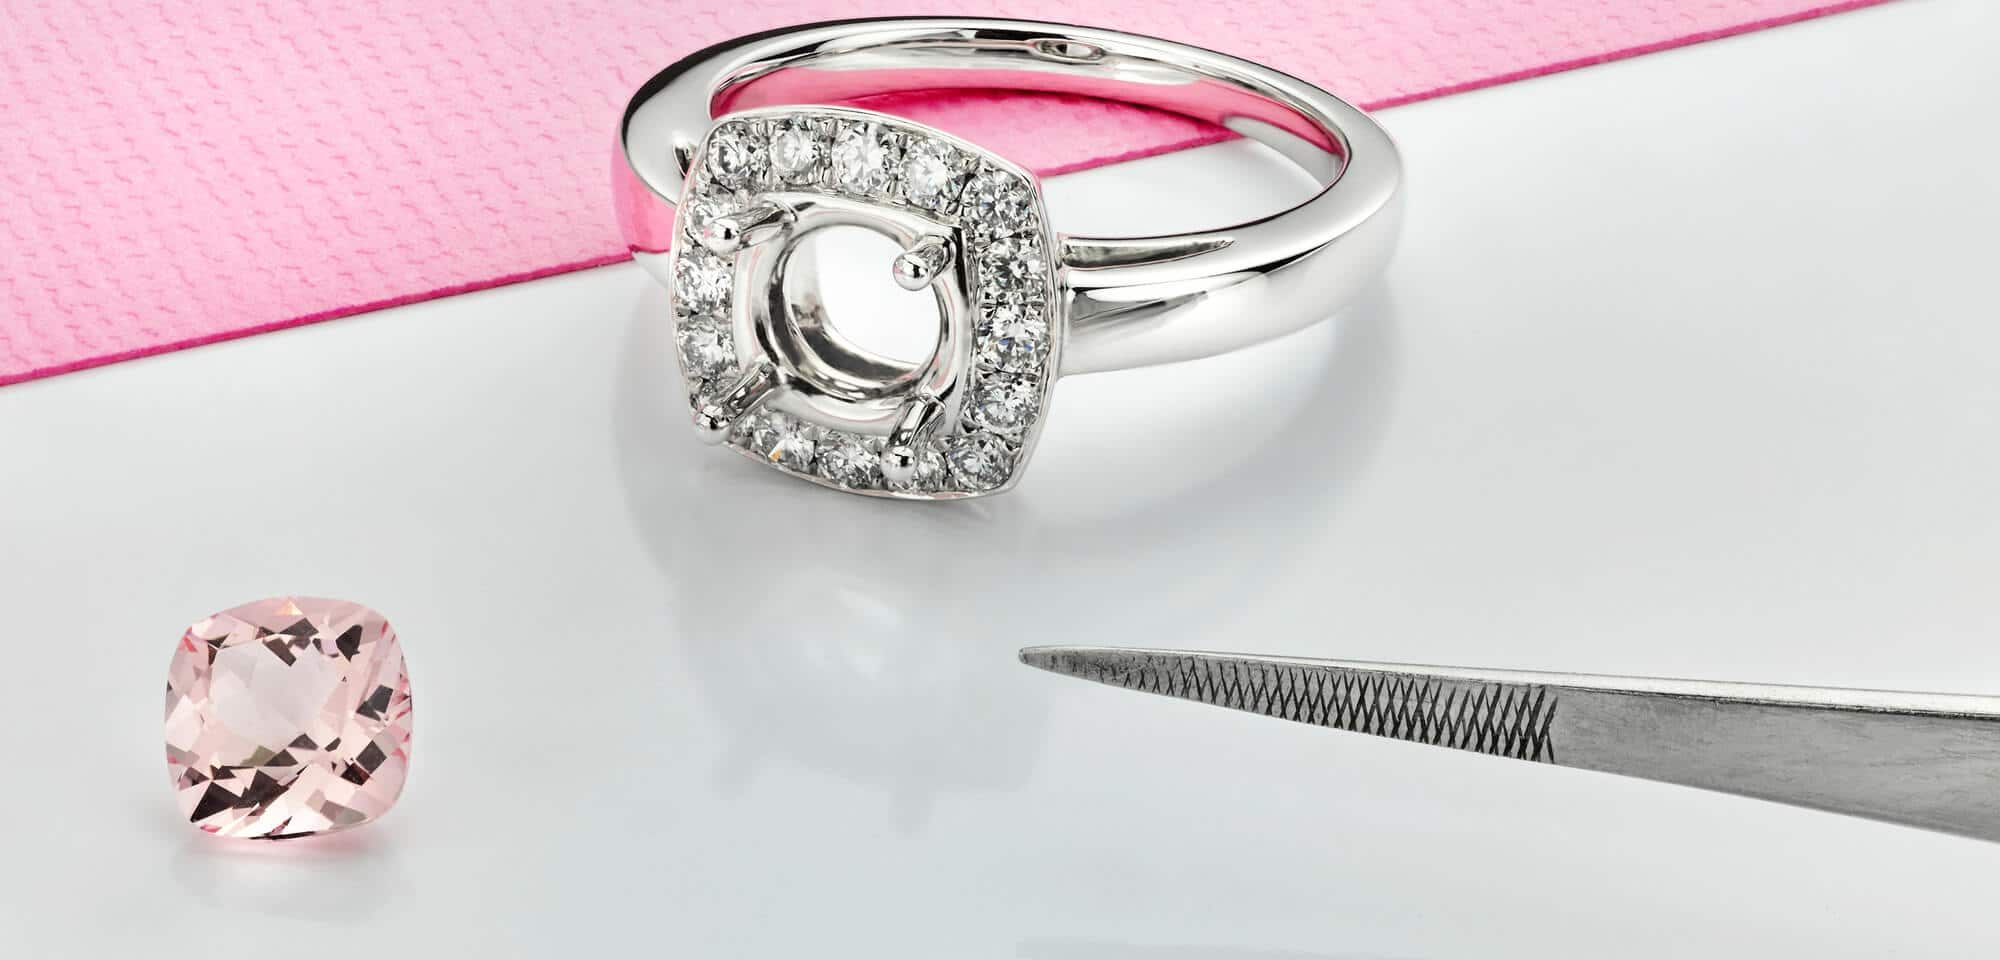 Big Engagement Rings Shira Diamonds E1614581166415, Shira Diamonds